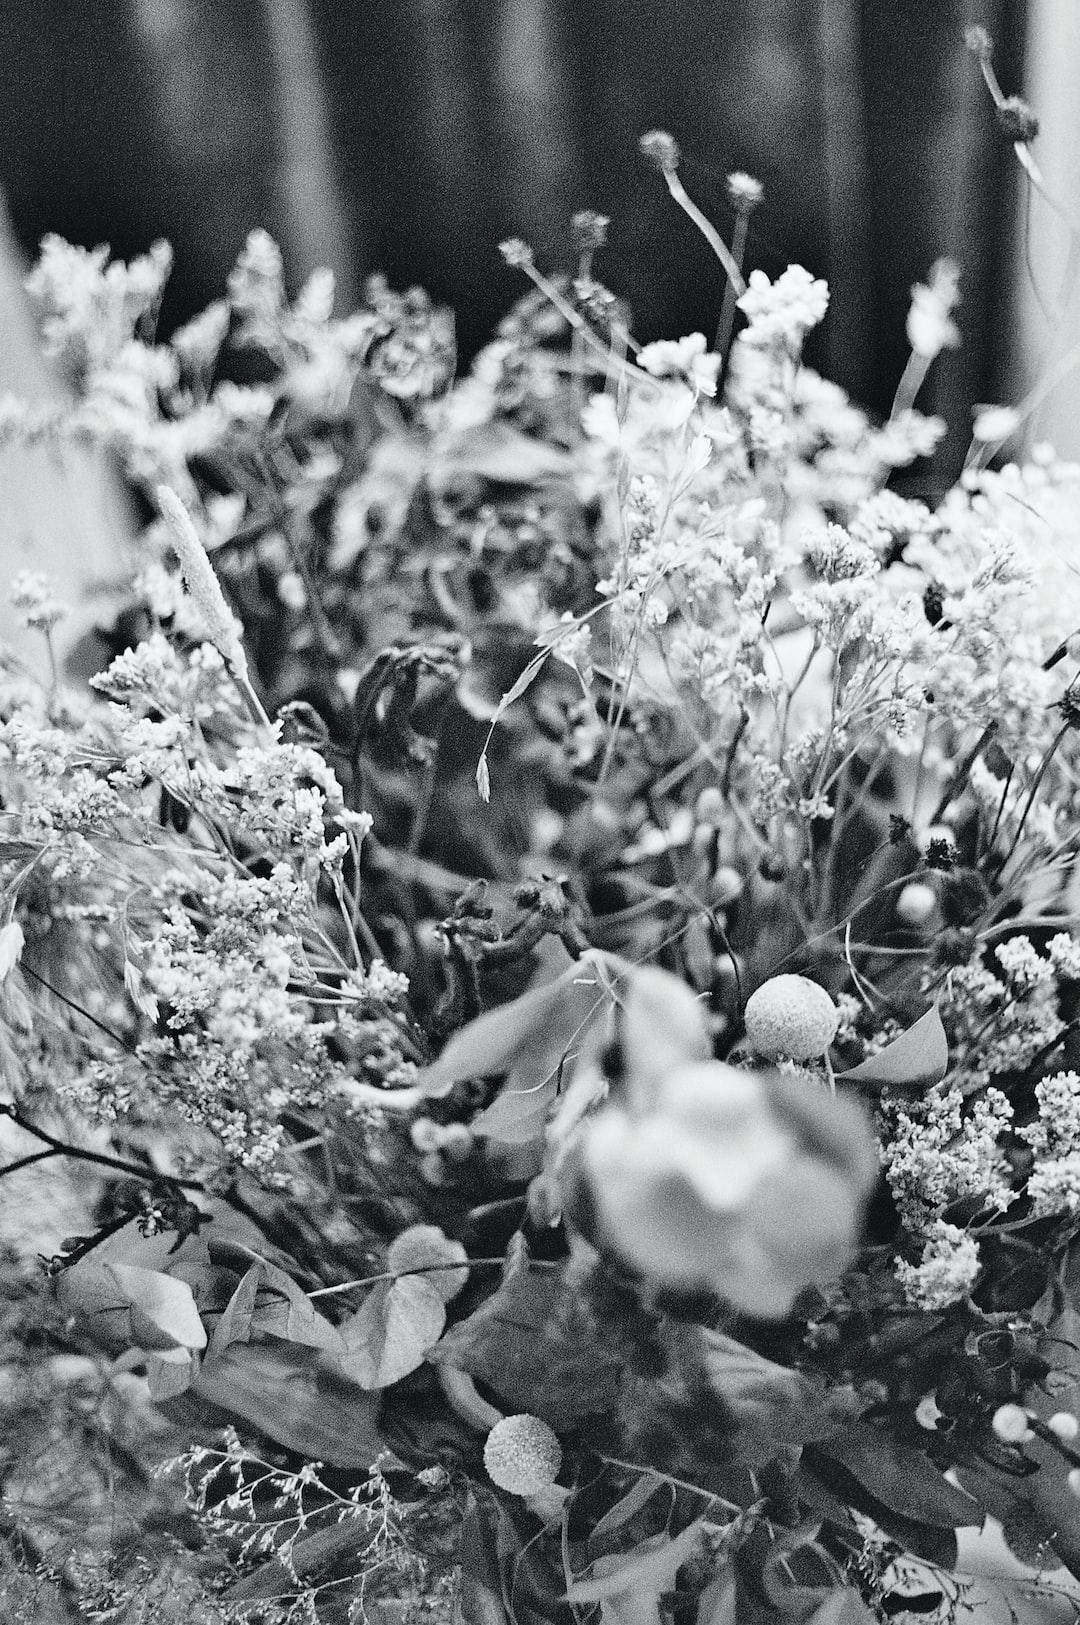 Flower bouquet. Tallinn, Estonia 2019